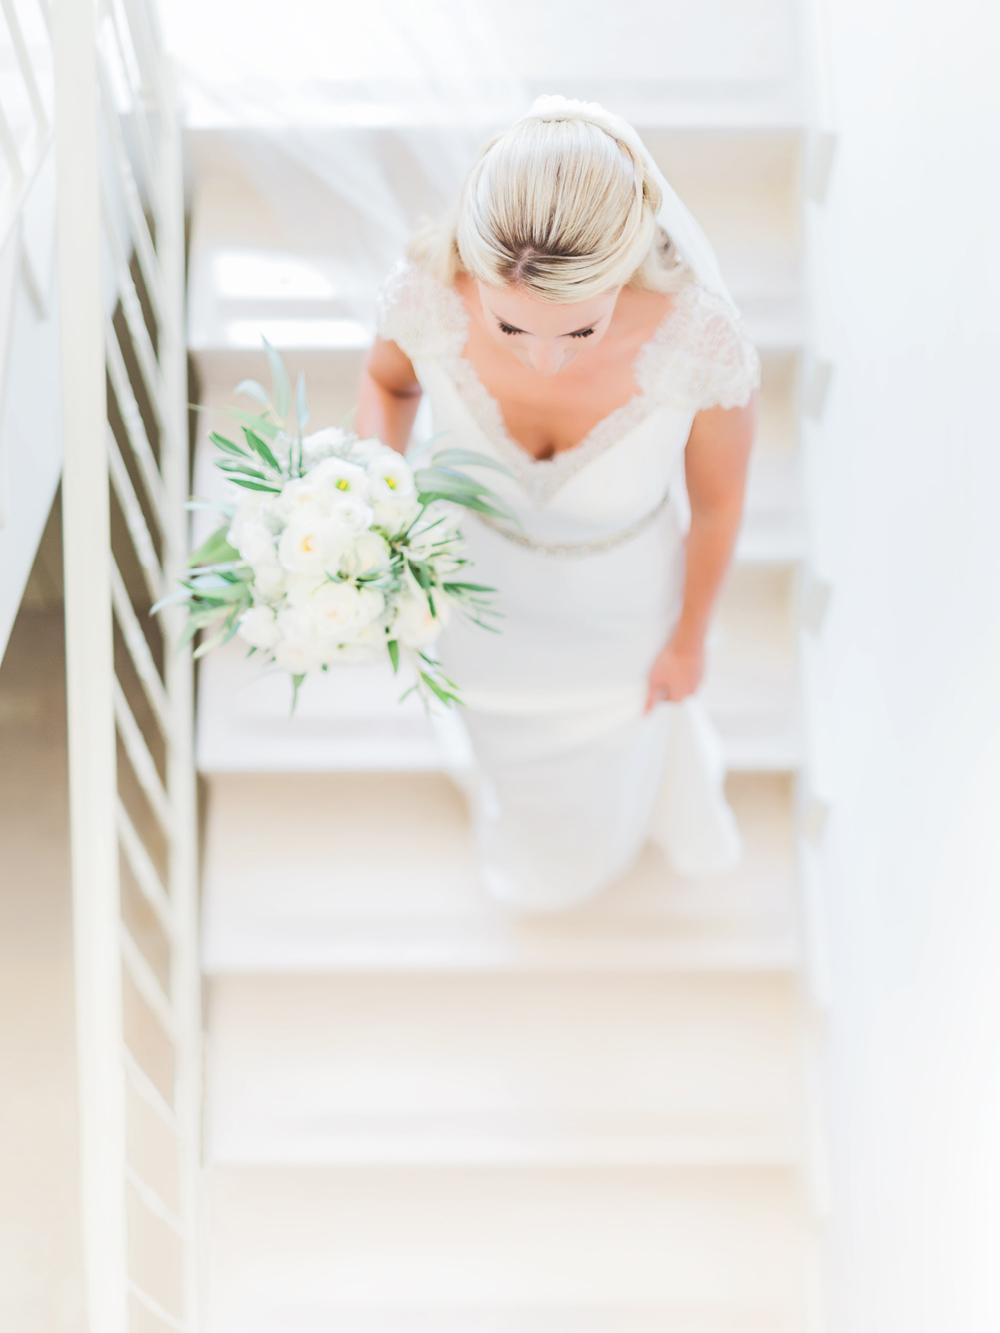 algarve_wedding_photography_eimear_marc_13.jpg